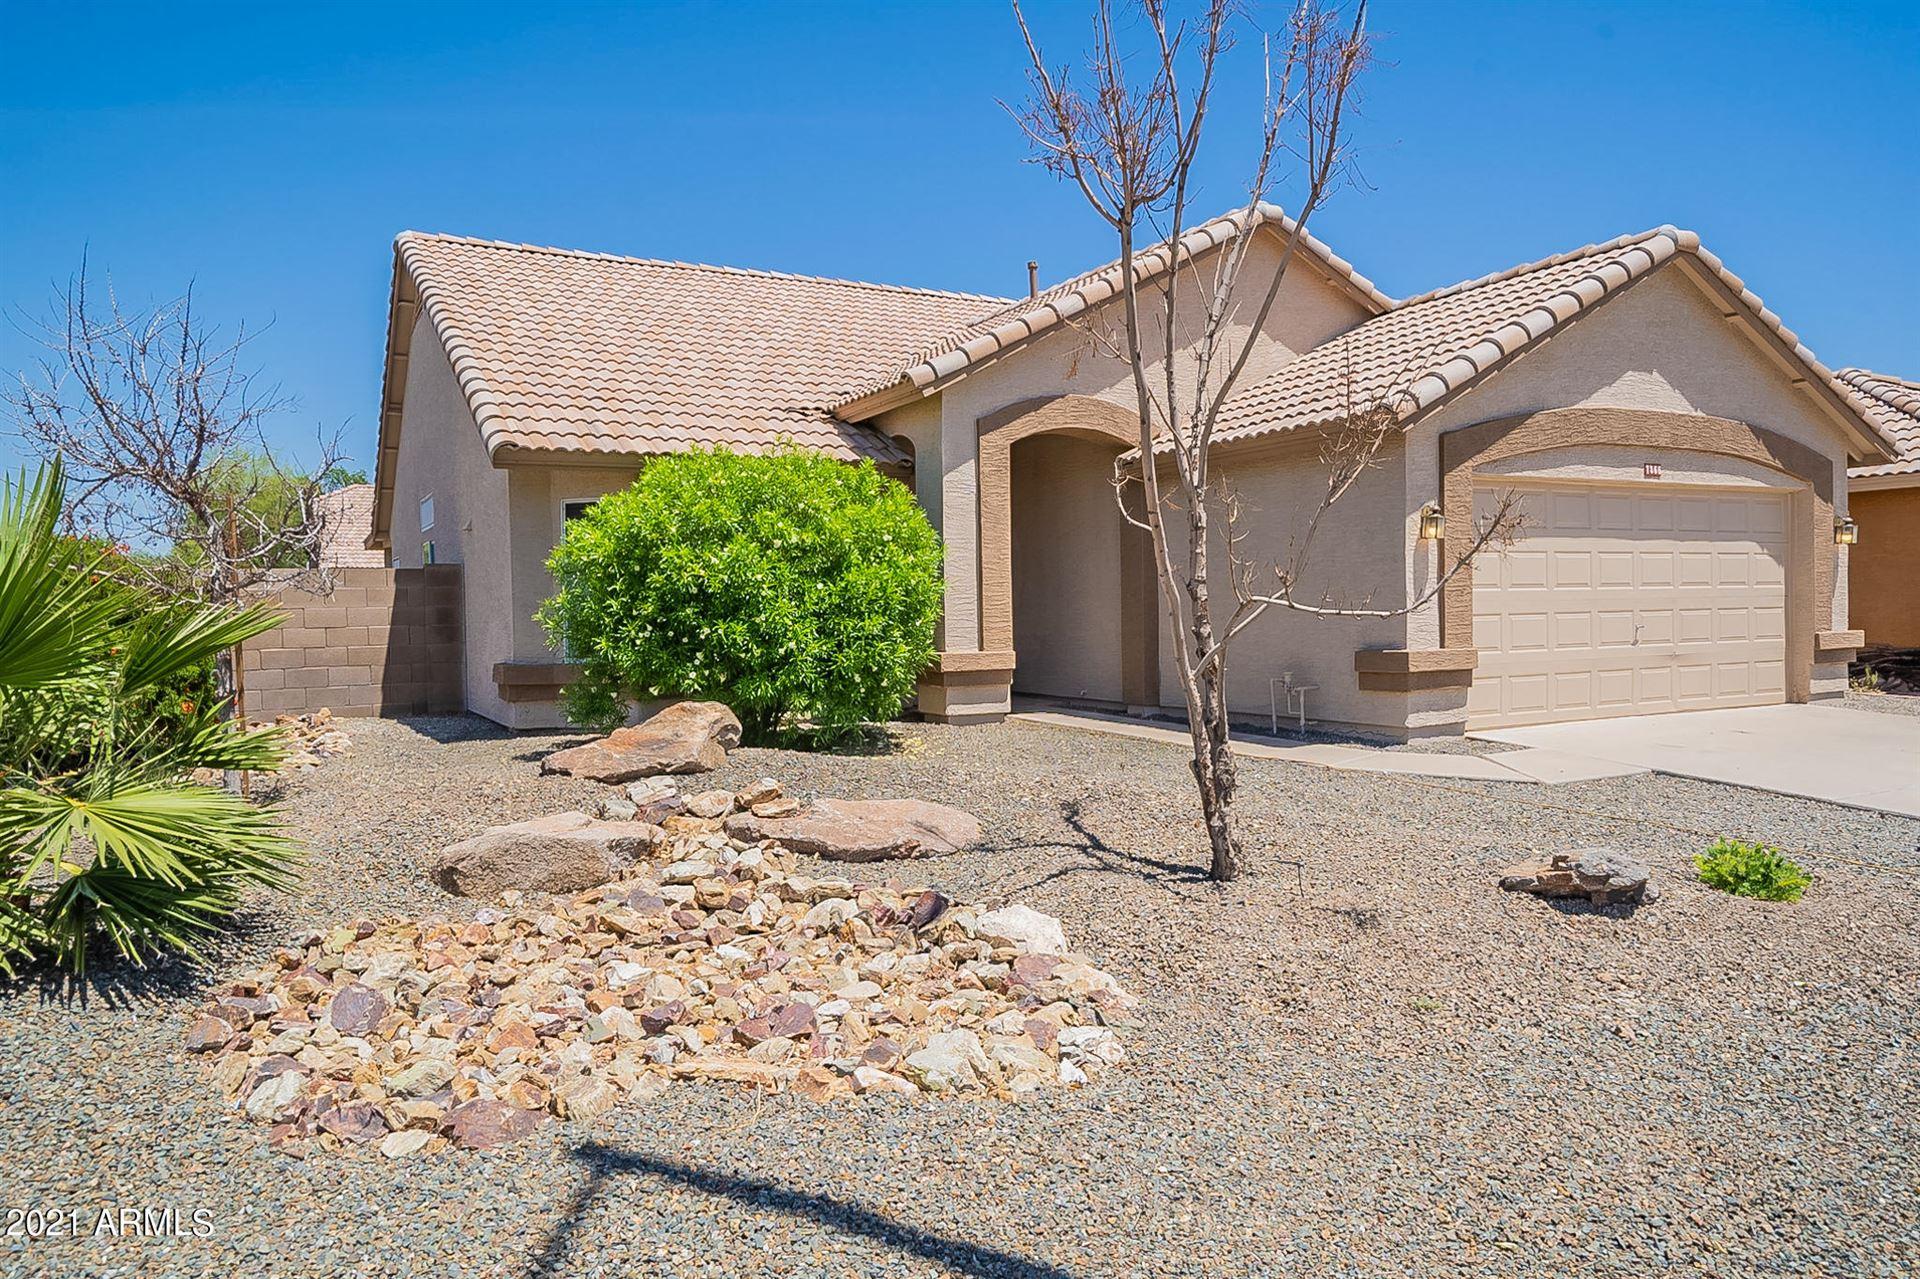 Photo of 7566 W Cholla Street, Peoria, AZ 85345 (MLS # 6232492)